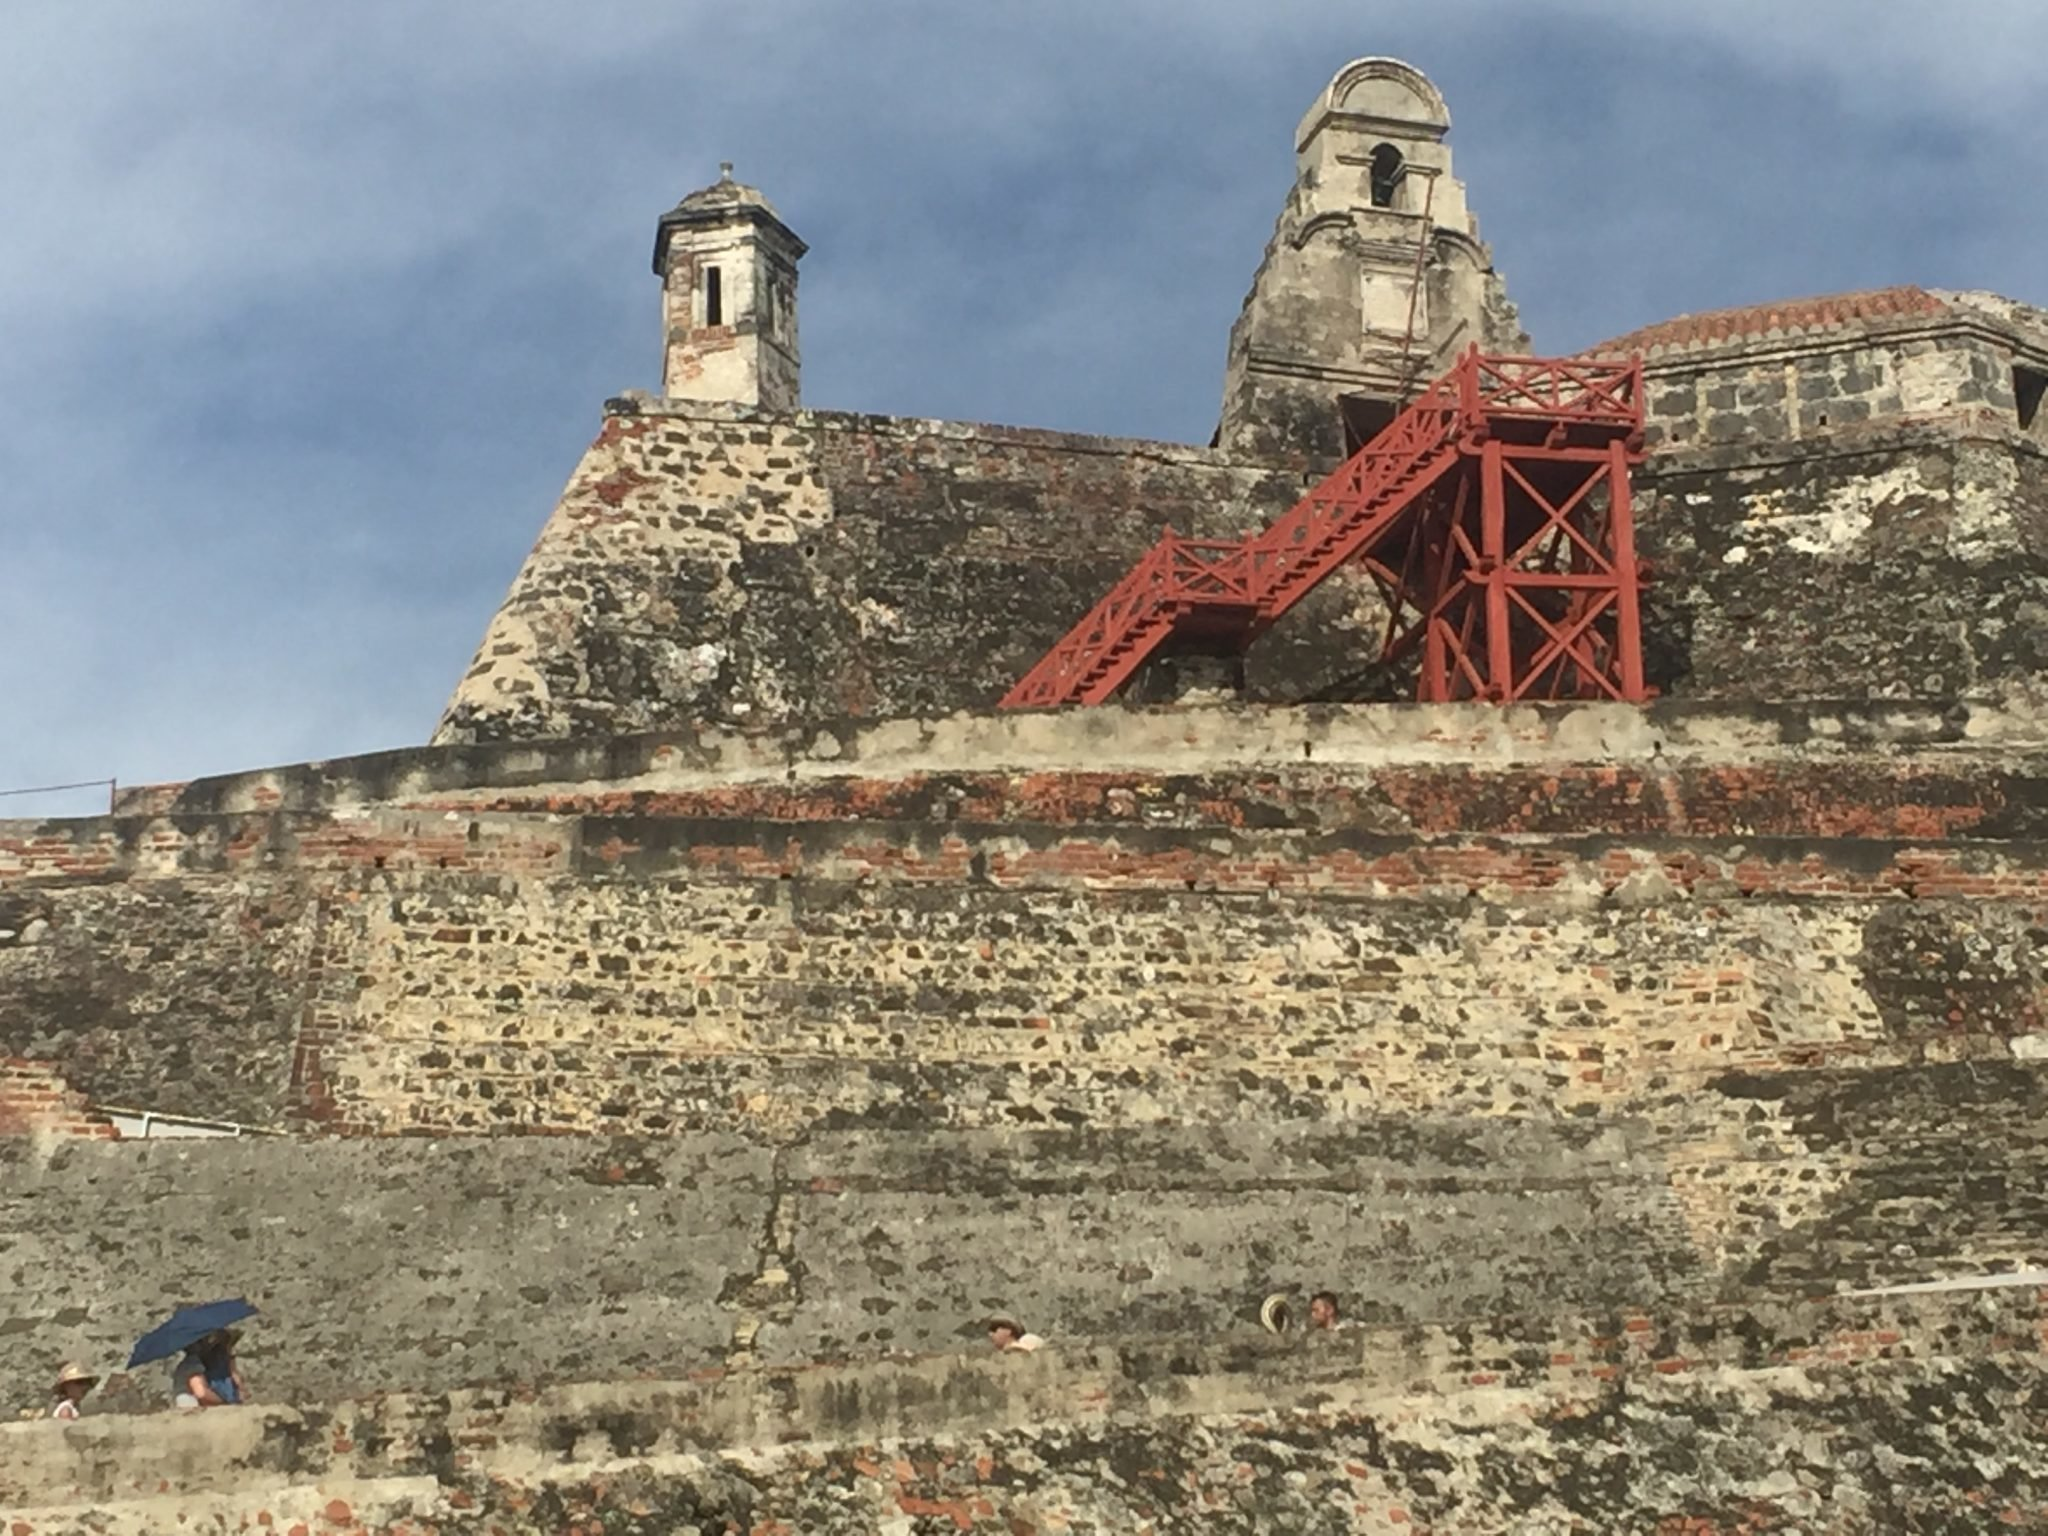 Cartagena e o Castelo de San Felipe de Barajas